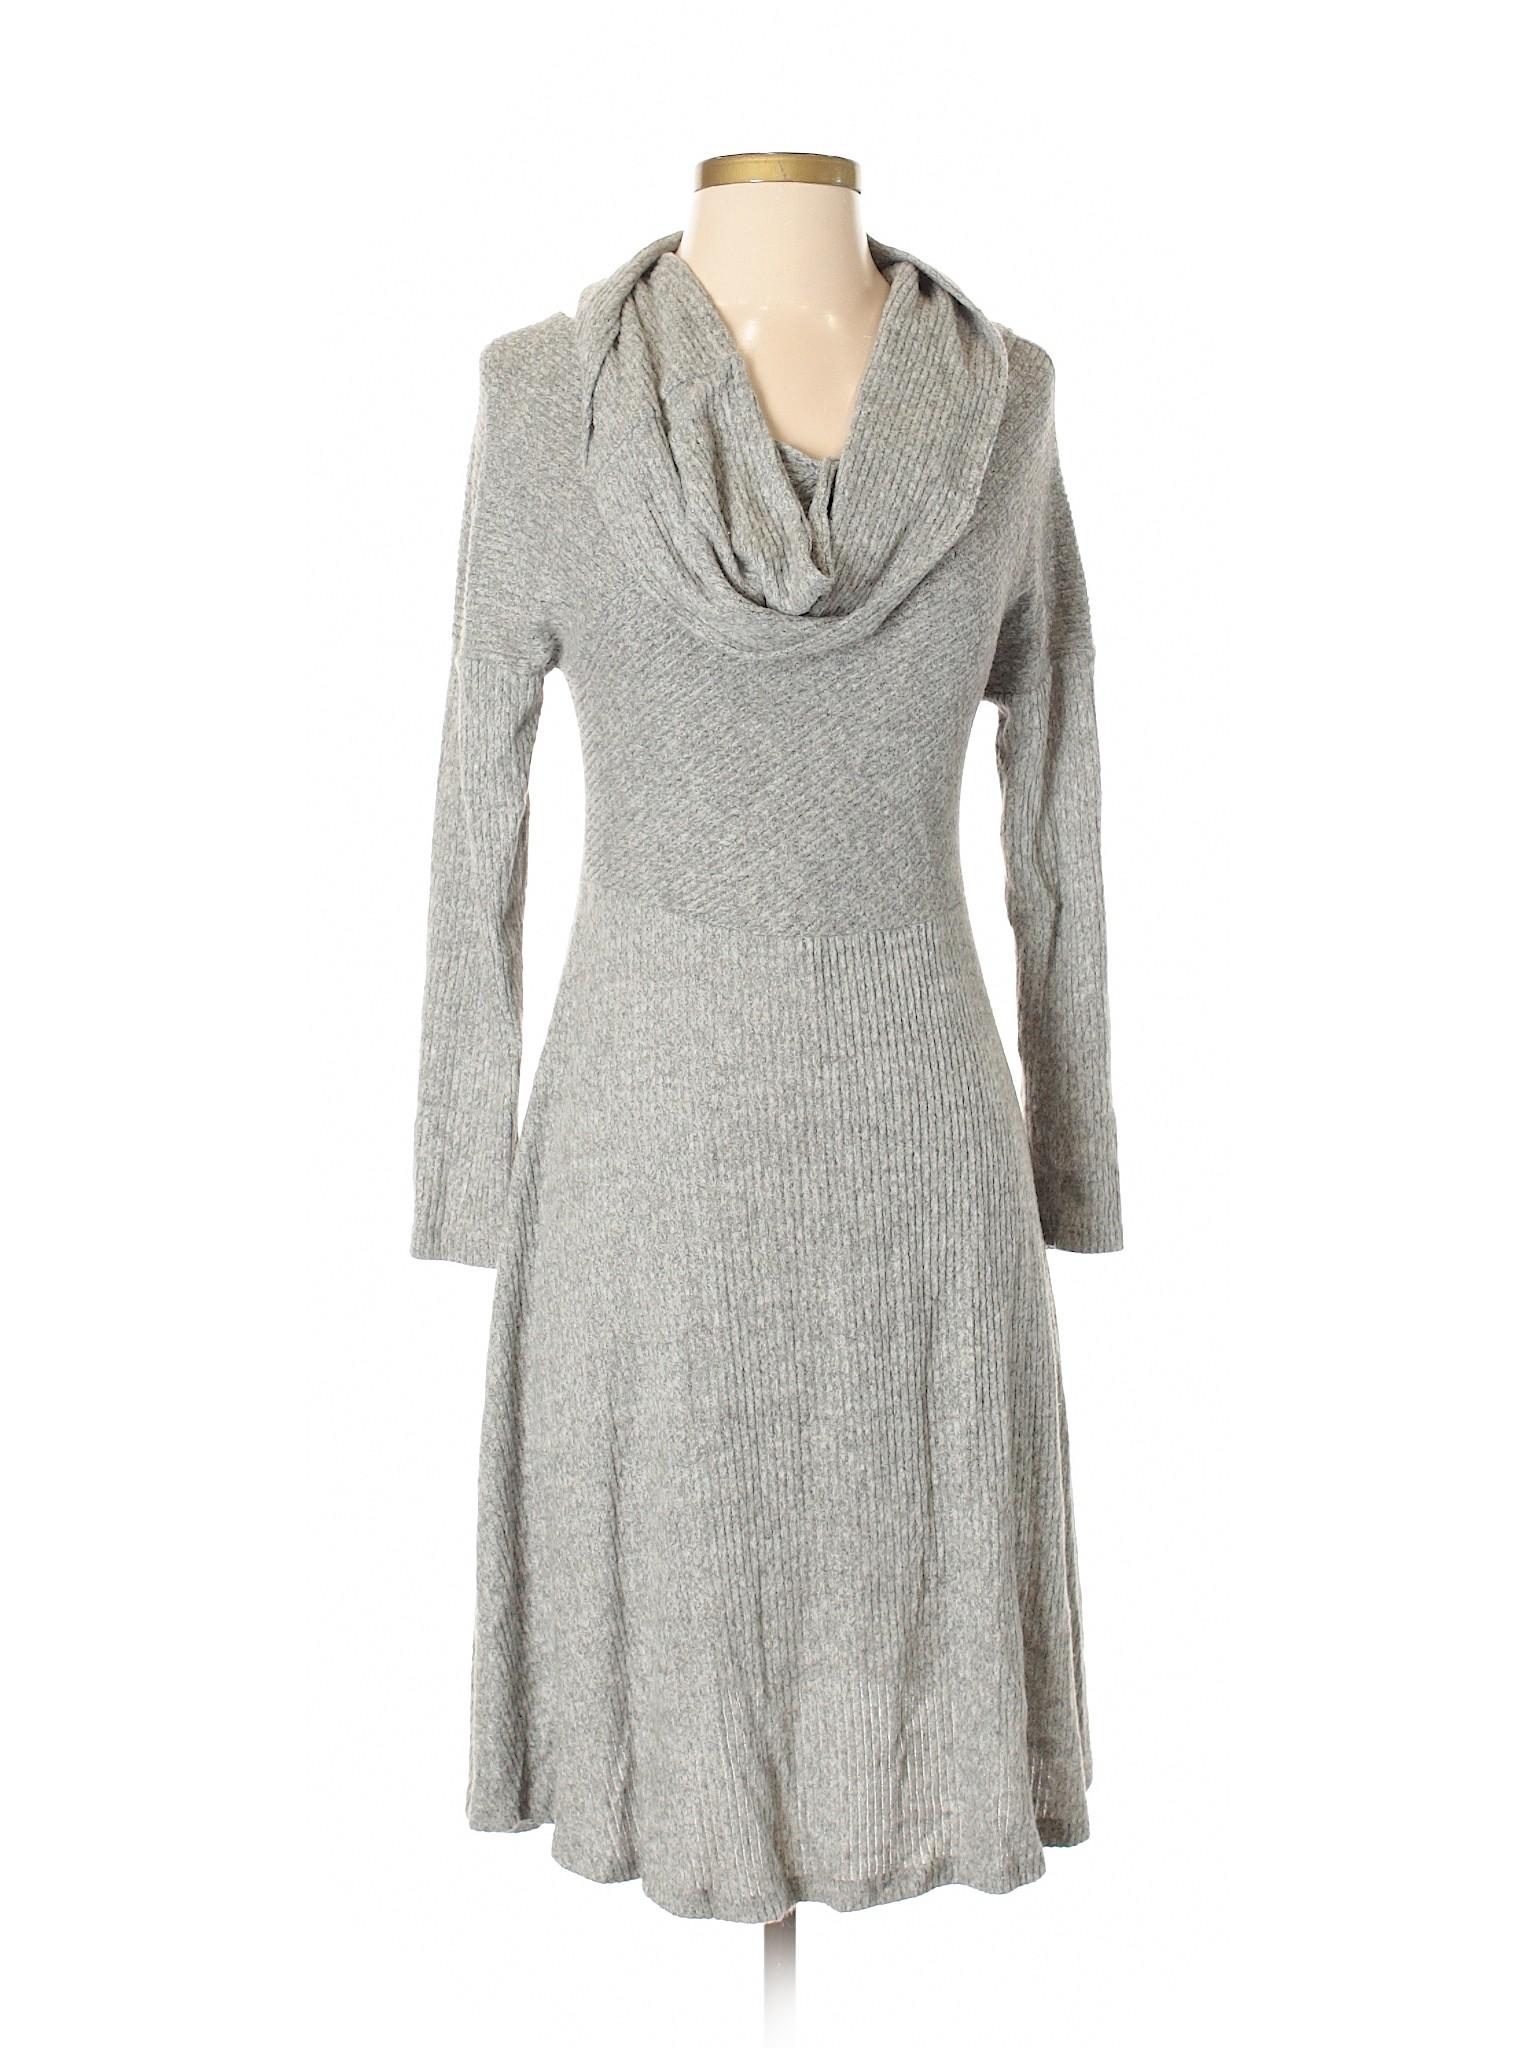 winter Boutique Love In Casual Dress qxOS6Xgpw